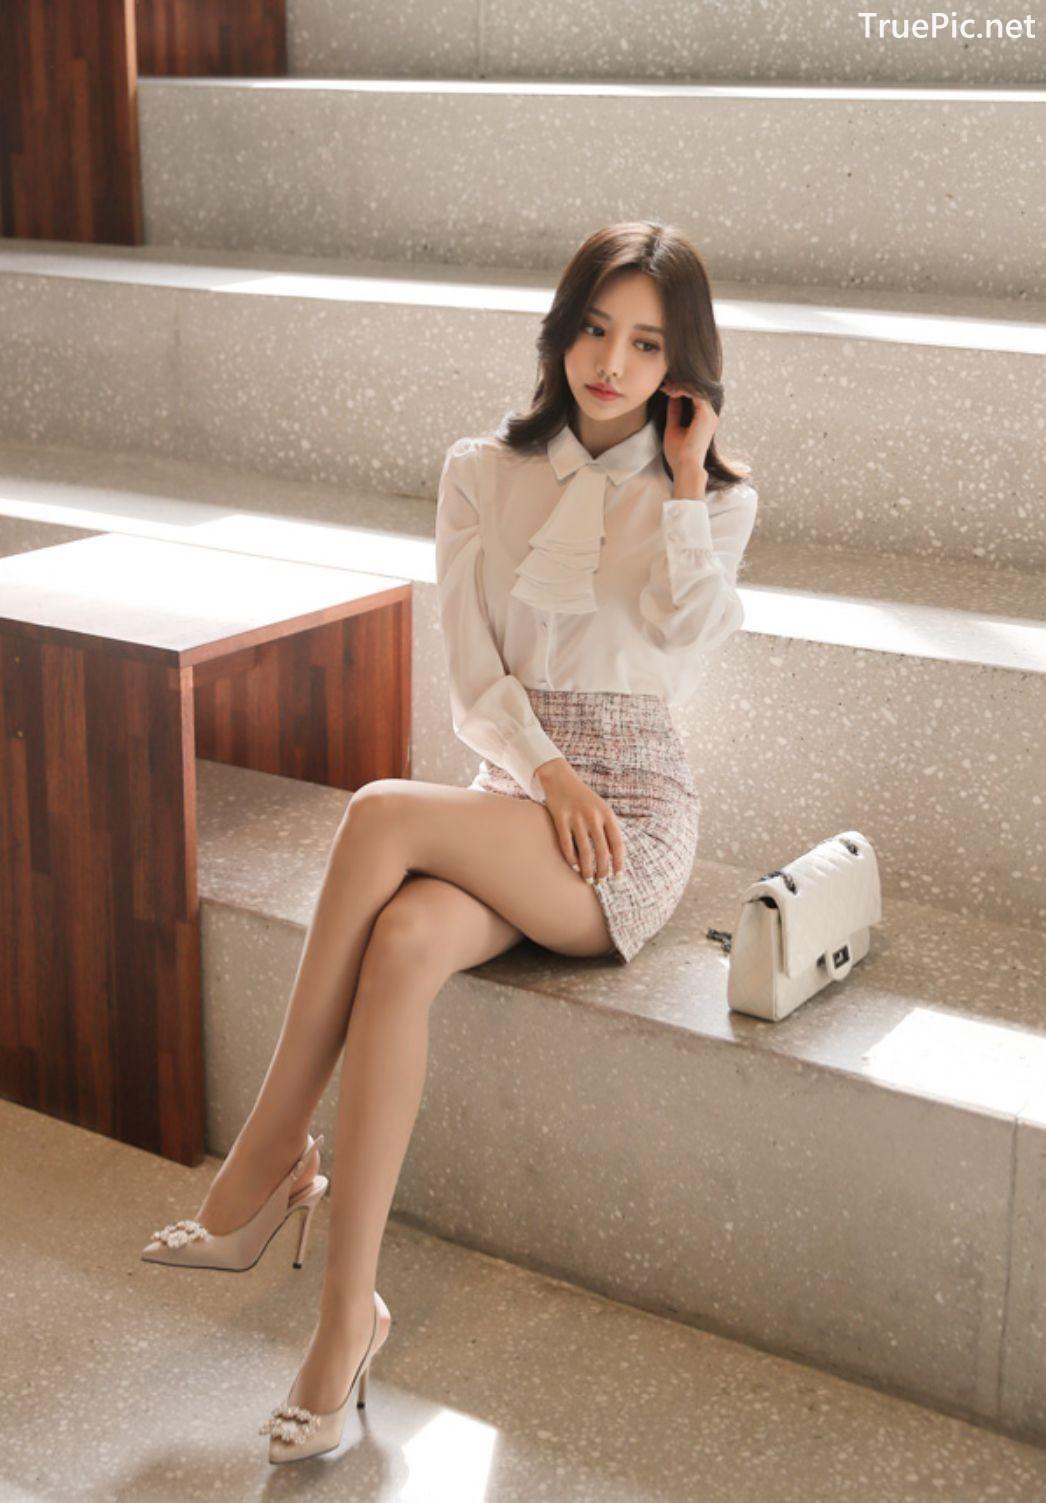 Image-Hot-Korean-Fashion-Model-Son-Yoon-Joo-She-So-Lovely-With-Miniskirt-TruePic.net- Picture-1